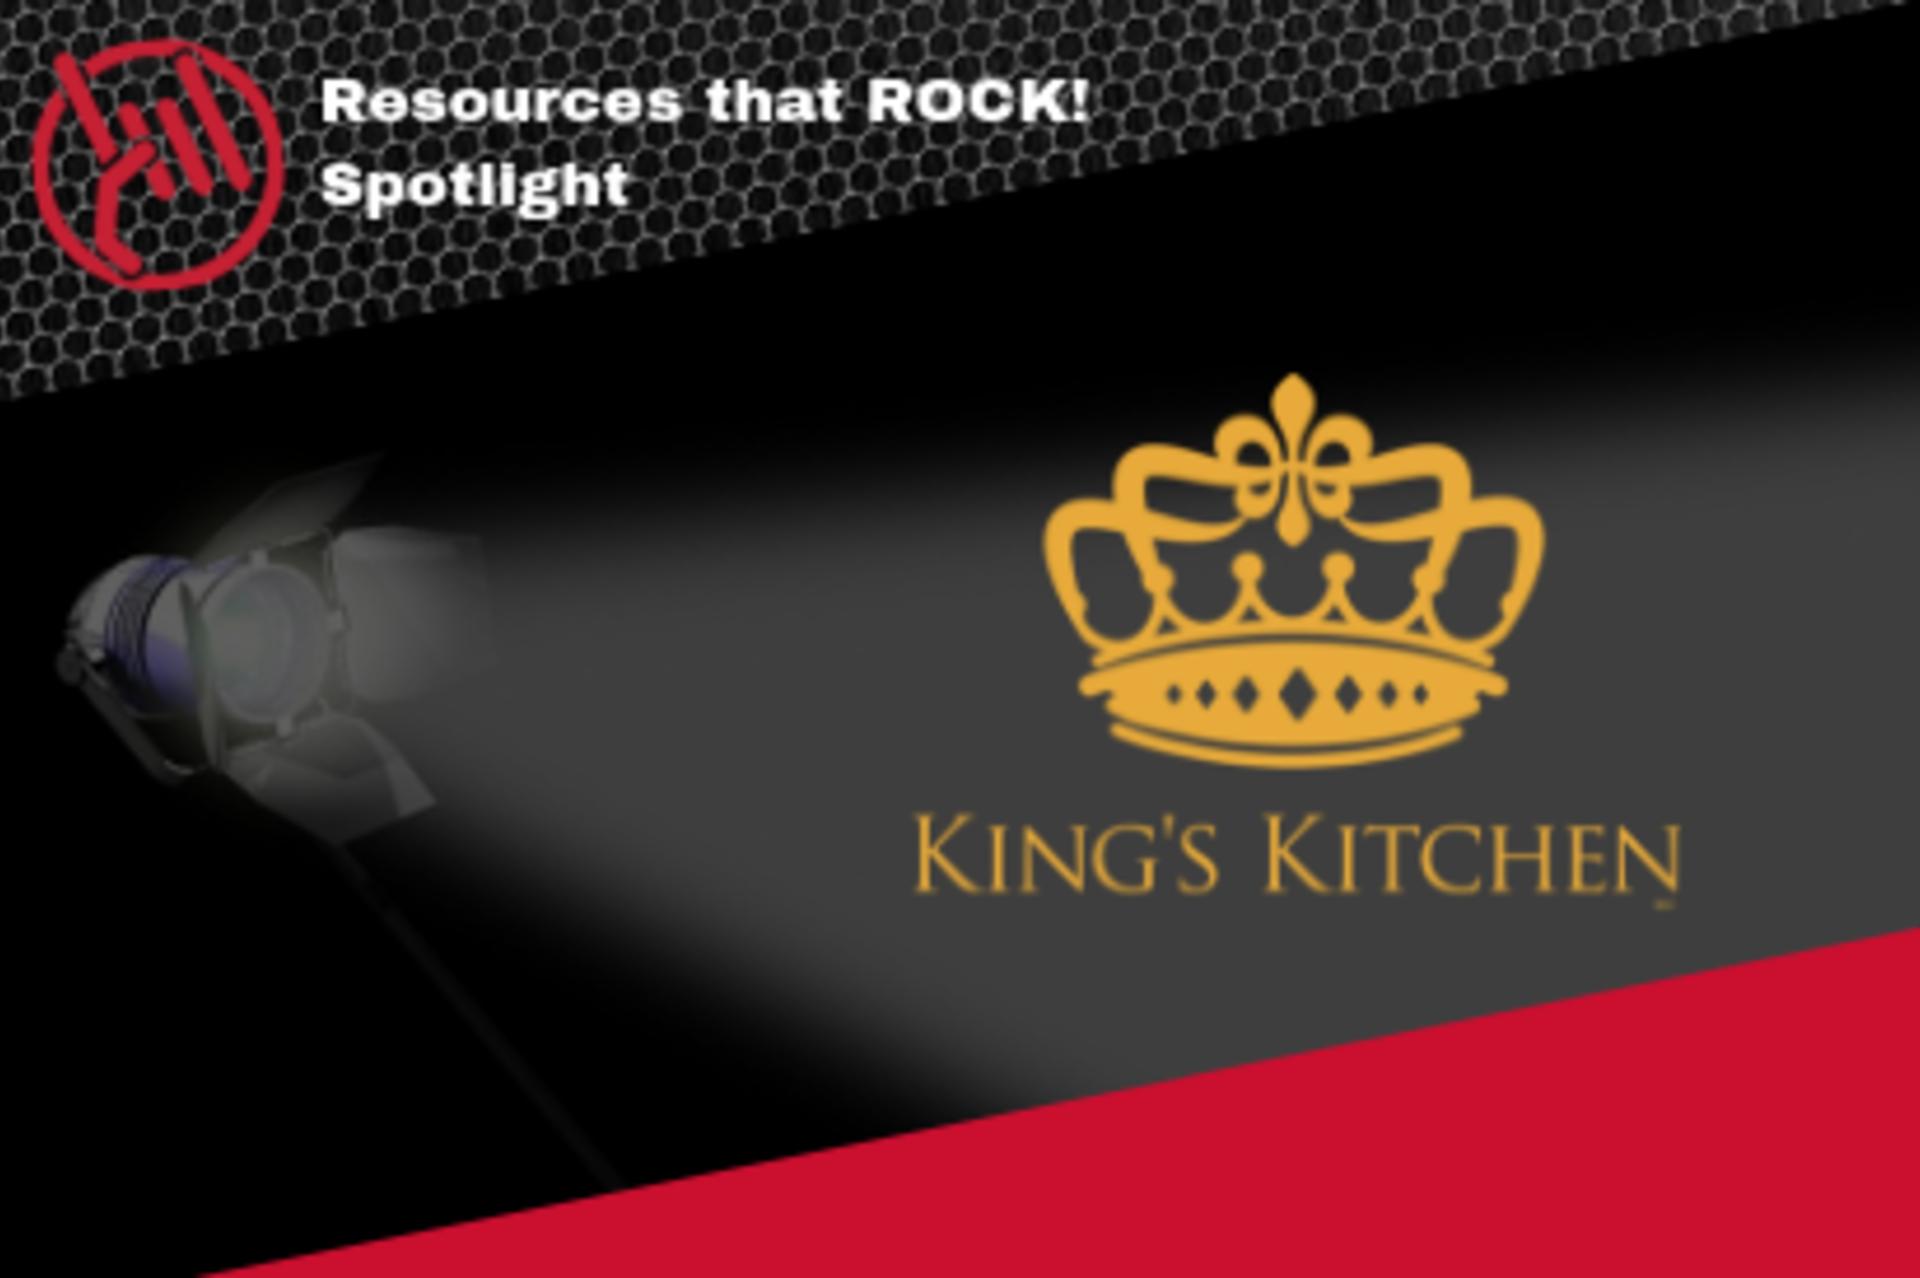 Resources that ROCK! Spotlight: A Kings Kitchen